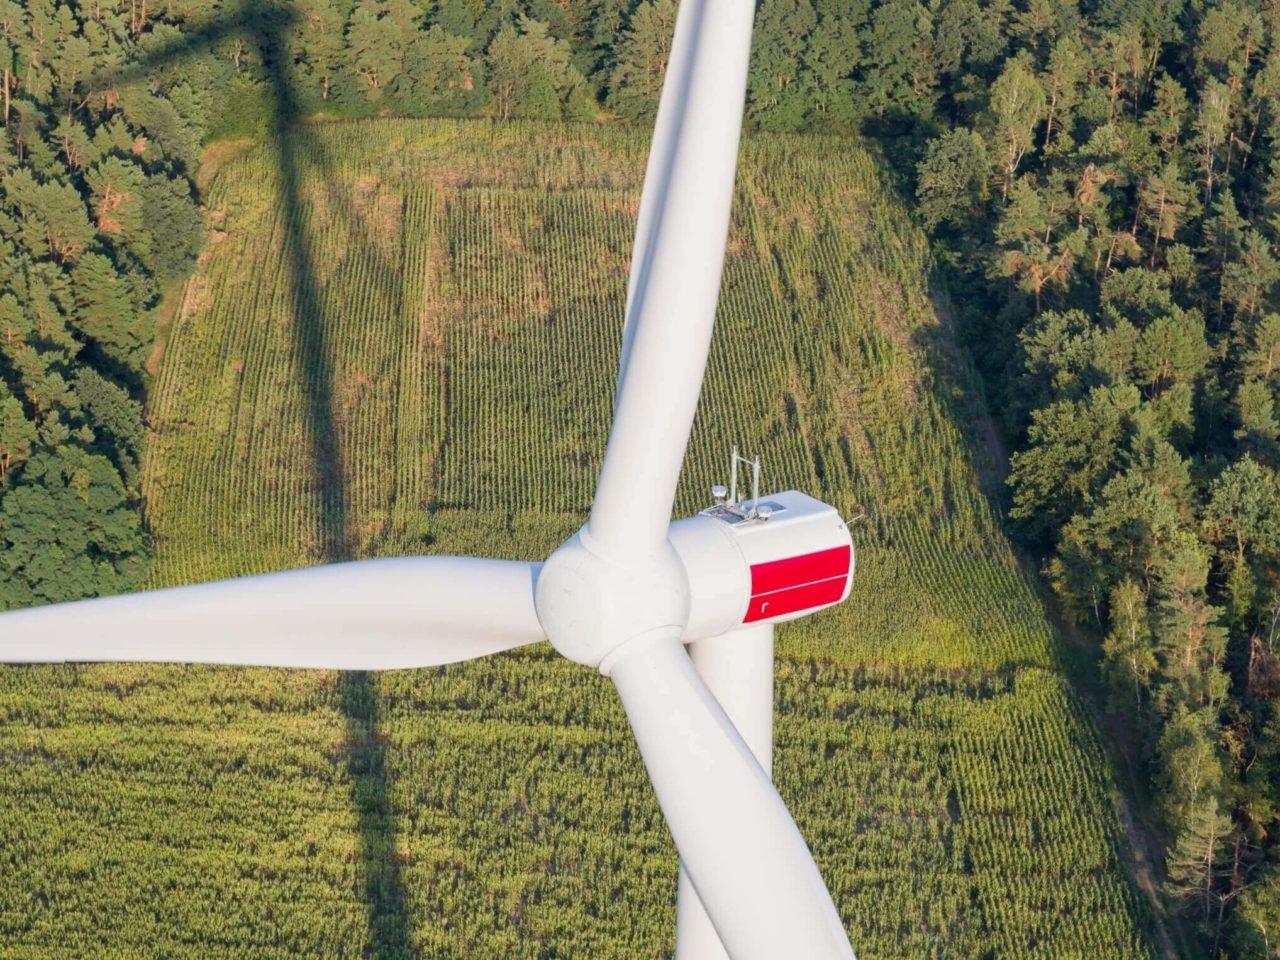 https://universalkraft.com/wp-content/uploads/2018/09/construction-and-operation-of-4-enercon-turbins-1280x960.jpg